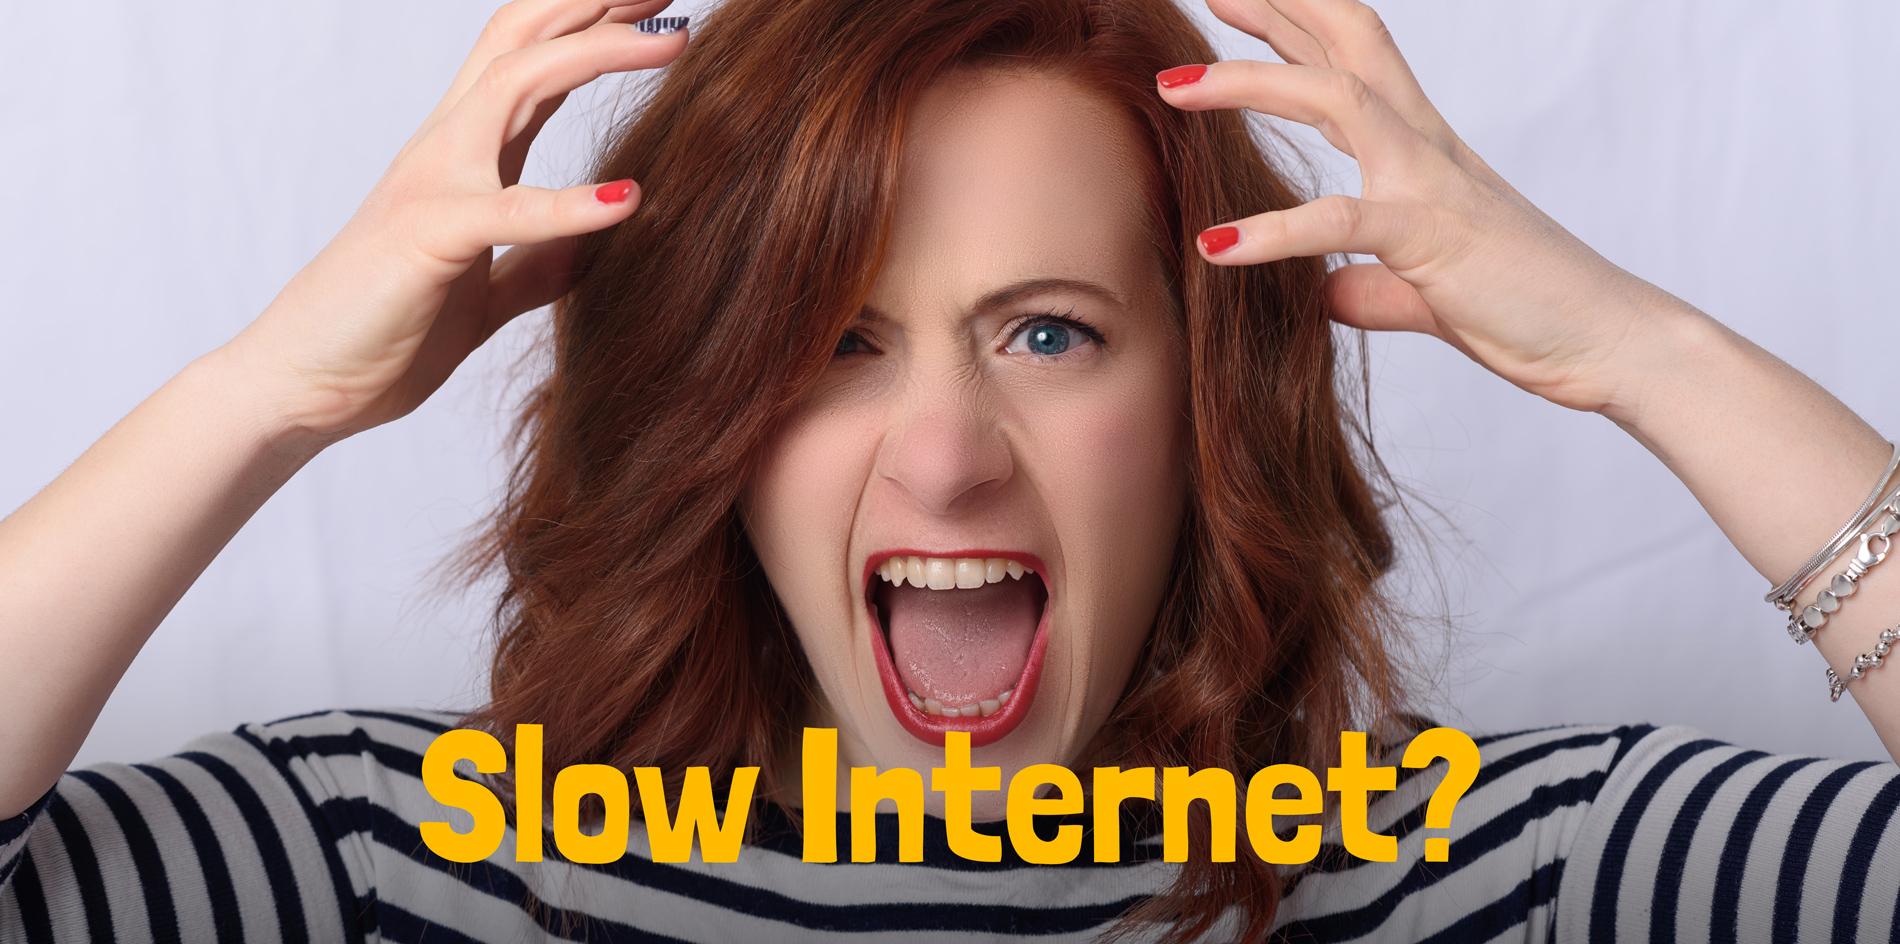 5 ways to improve your internet speed